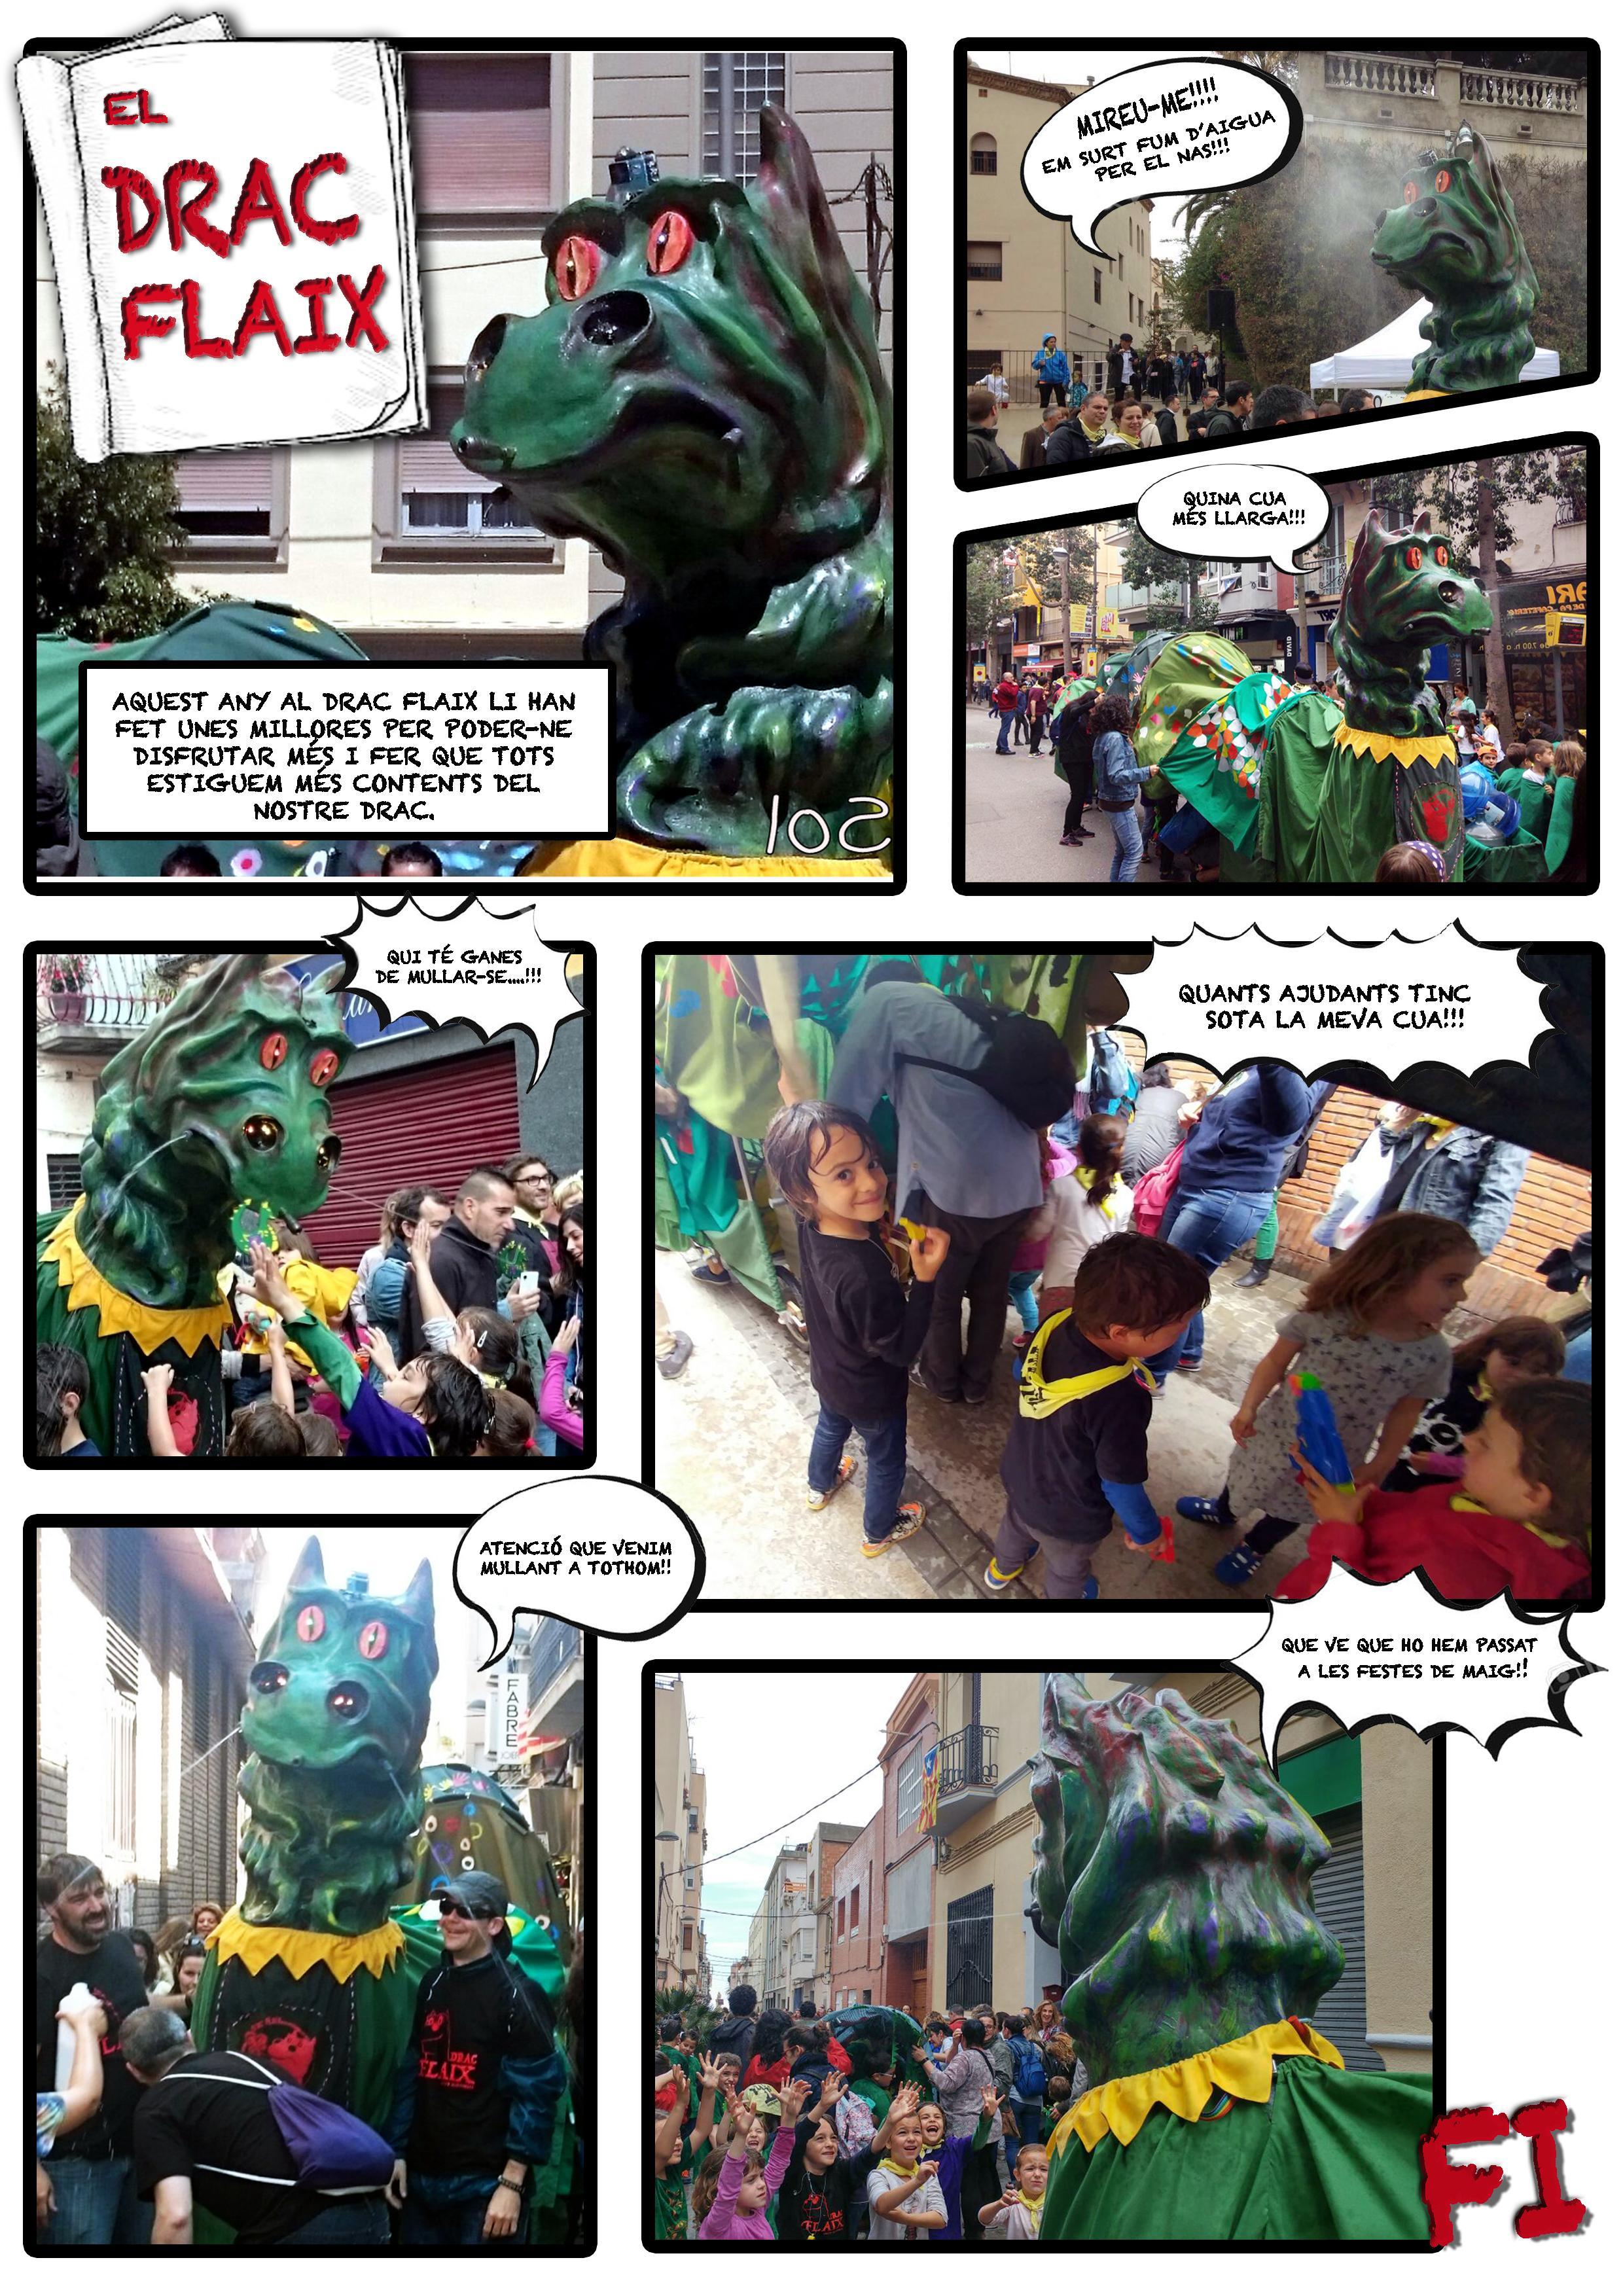 comic-drac-flaix-page-0011